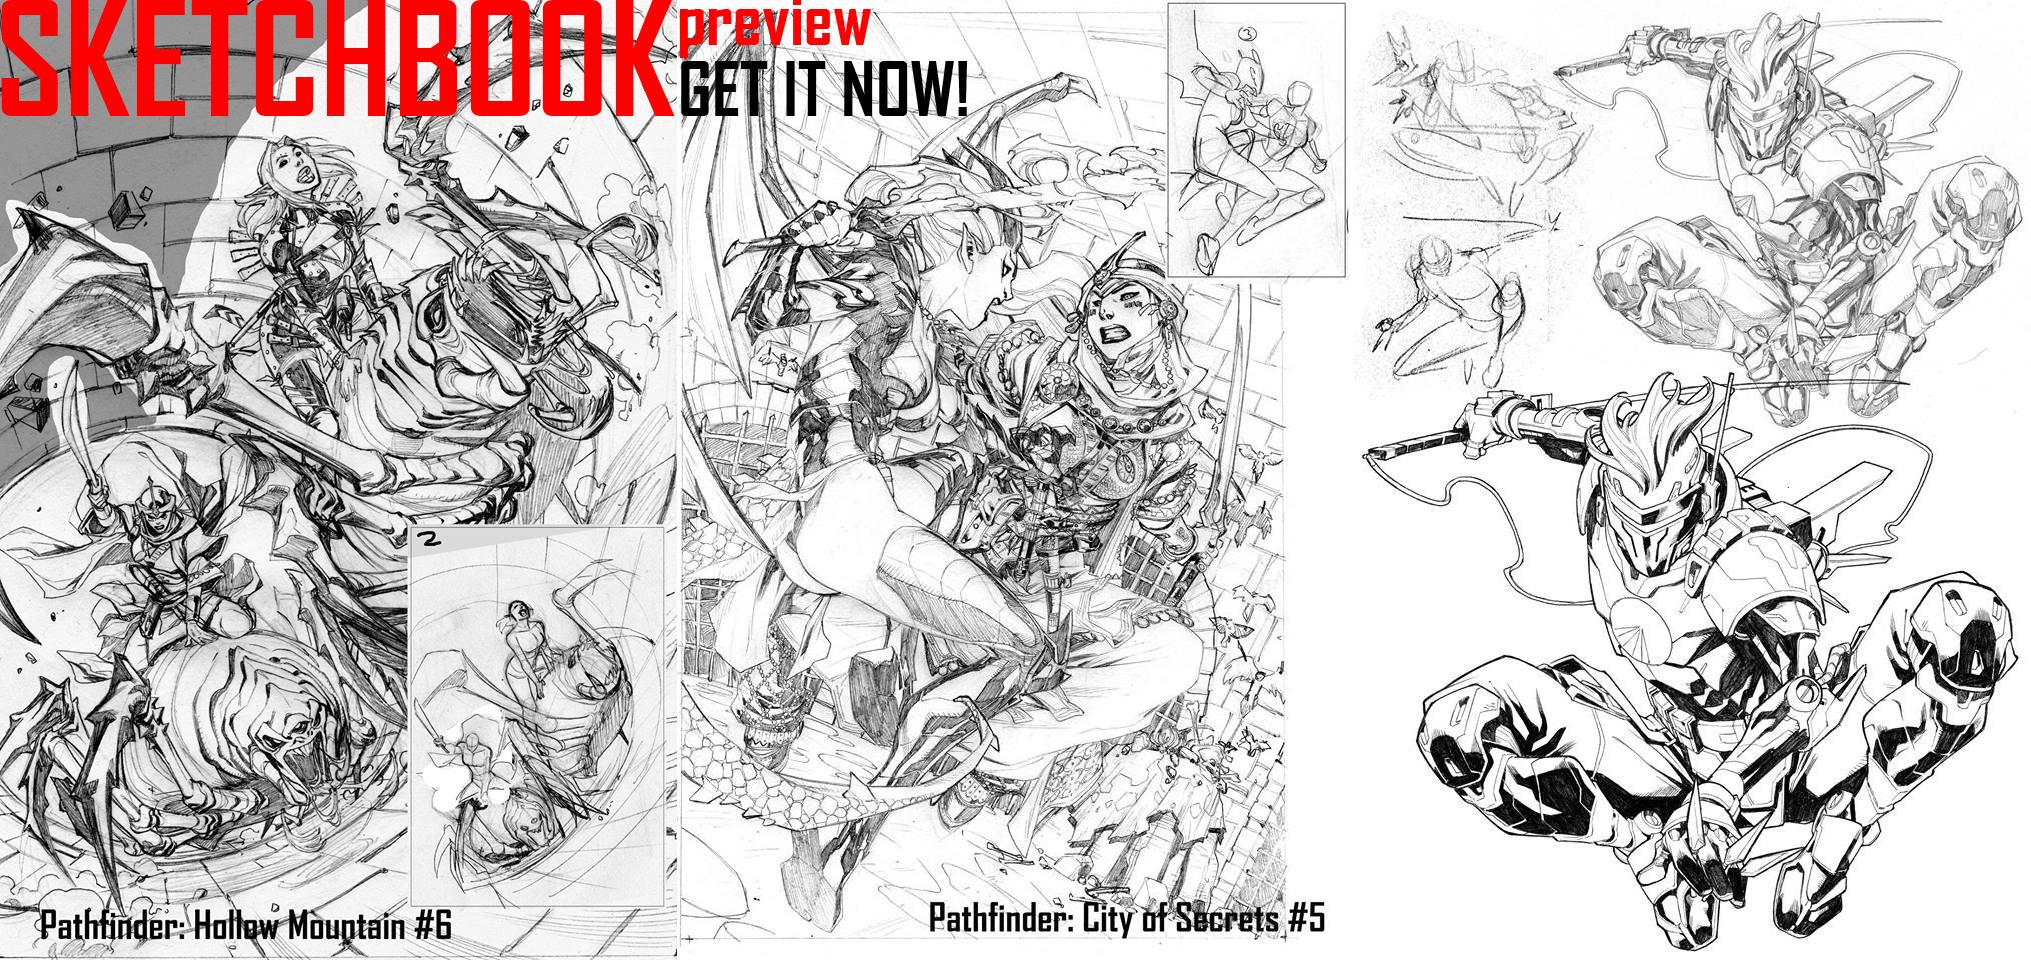 SKETCHBOOK Preview! by CarlosGomezArtist